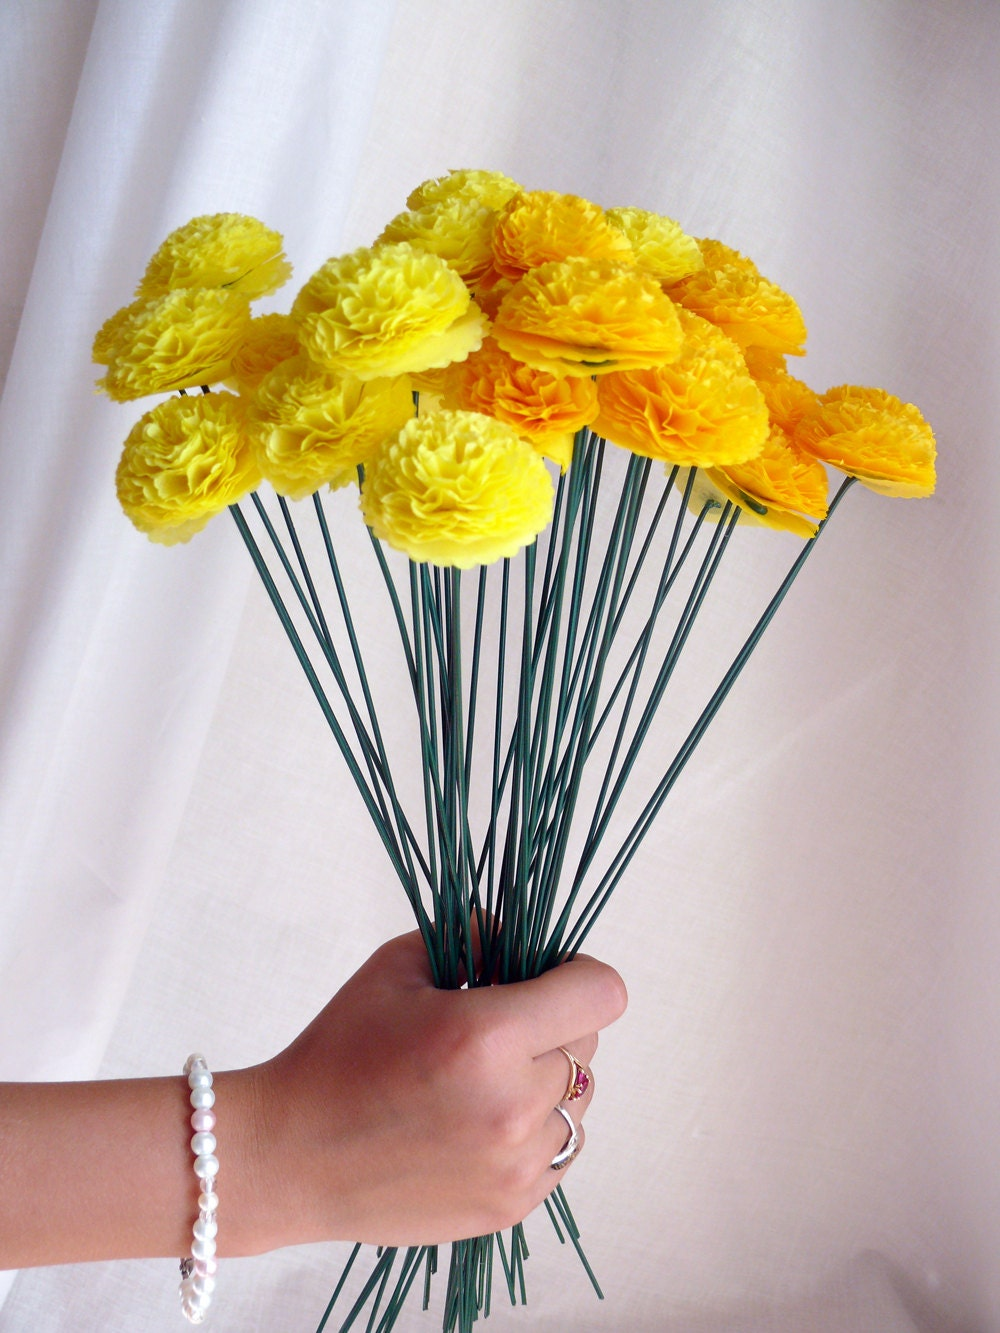 Button Bridal Bouquet Etsy : Button mums tissue paper flower bouquet wedding by zobedesigns